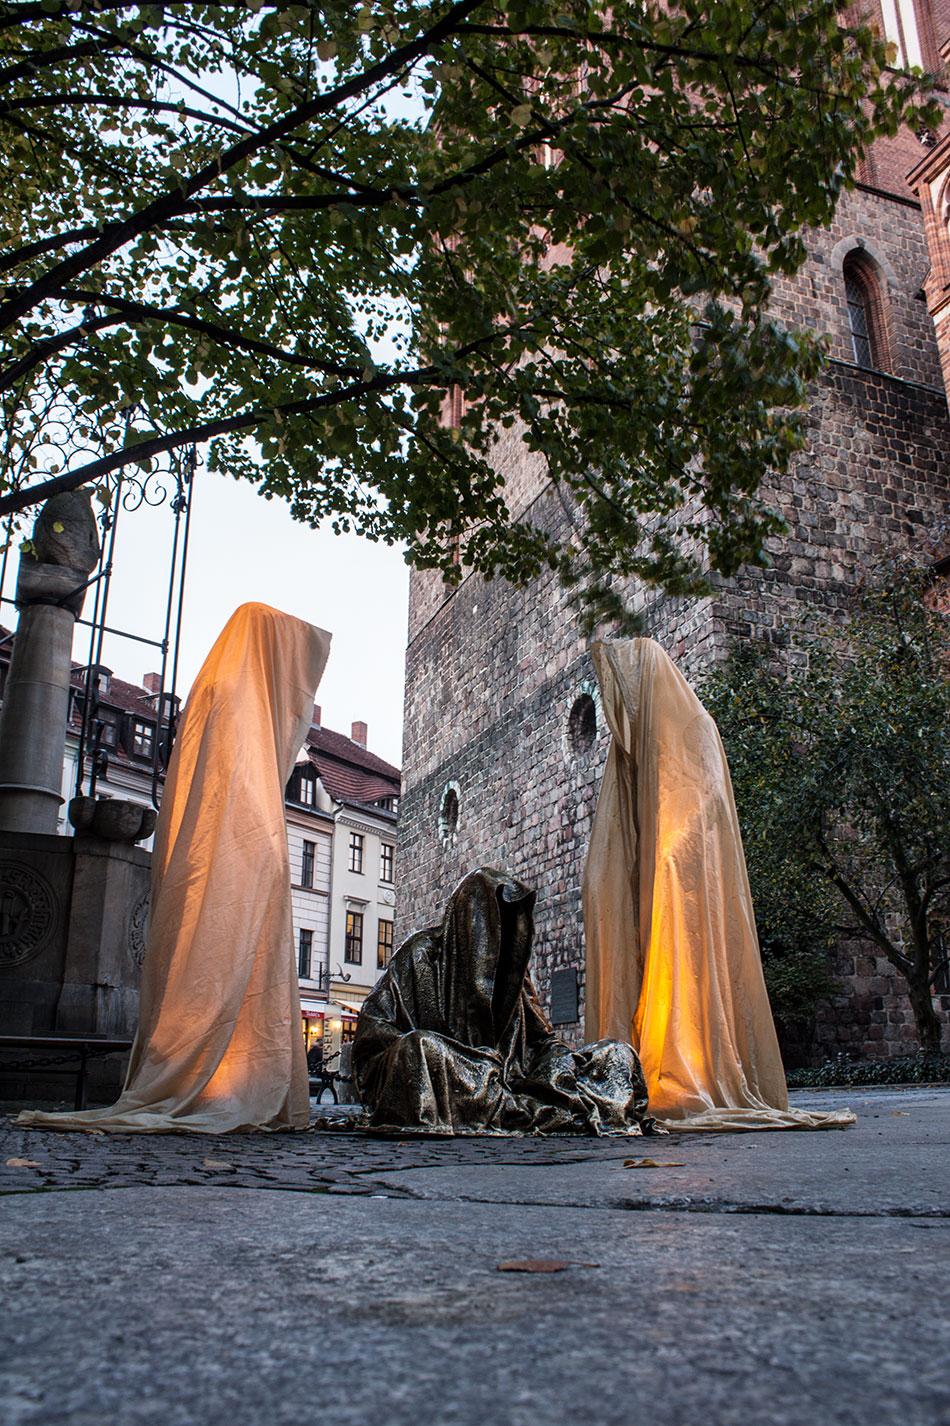 festival-of-lights-berlin-light-art-festival-contemporary-fine-art-design-show-guardiansof-time-manfred-kili-kielnhofer-sculpture-3677